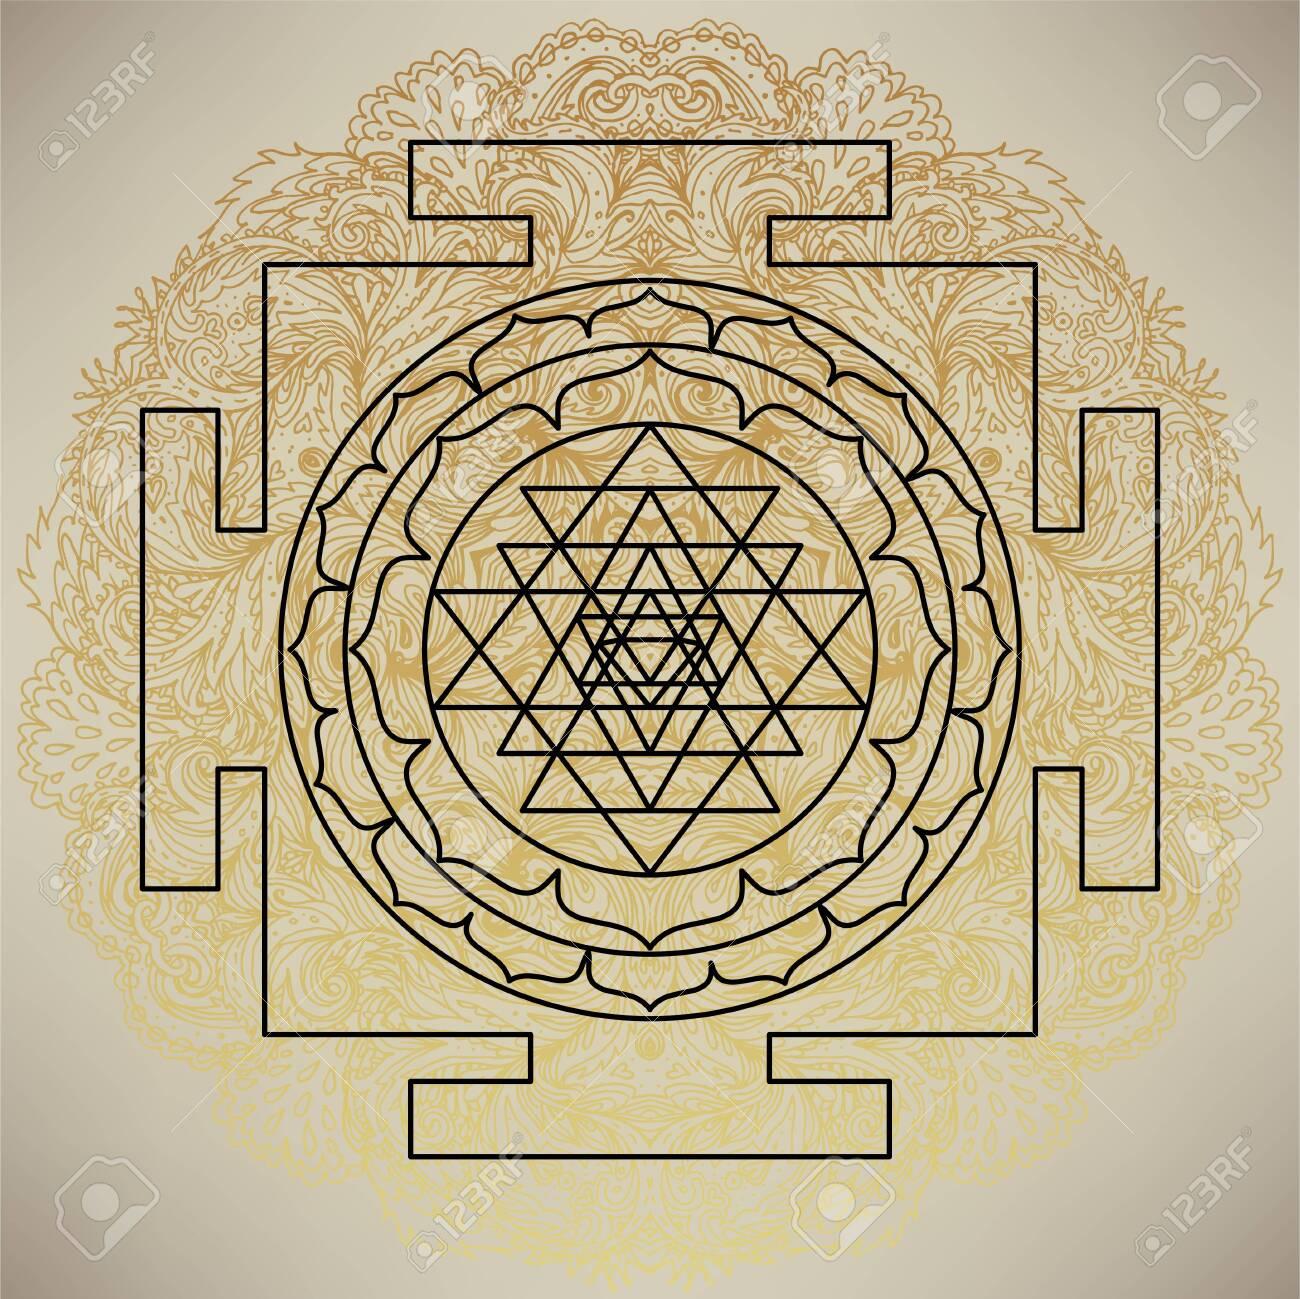 The Sri Yantra Or Sri Chakra Form Of Mystical Diagram Shri Vidya School Of Hindu Tantra Symbol Sacred Geometry Vector Design Element Vector Illustration Alchemy Occultism Spirituality Royalty Free Cliparts Vectors And